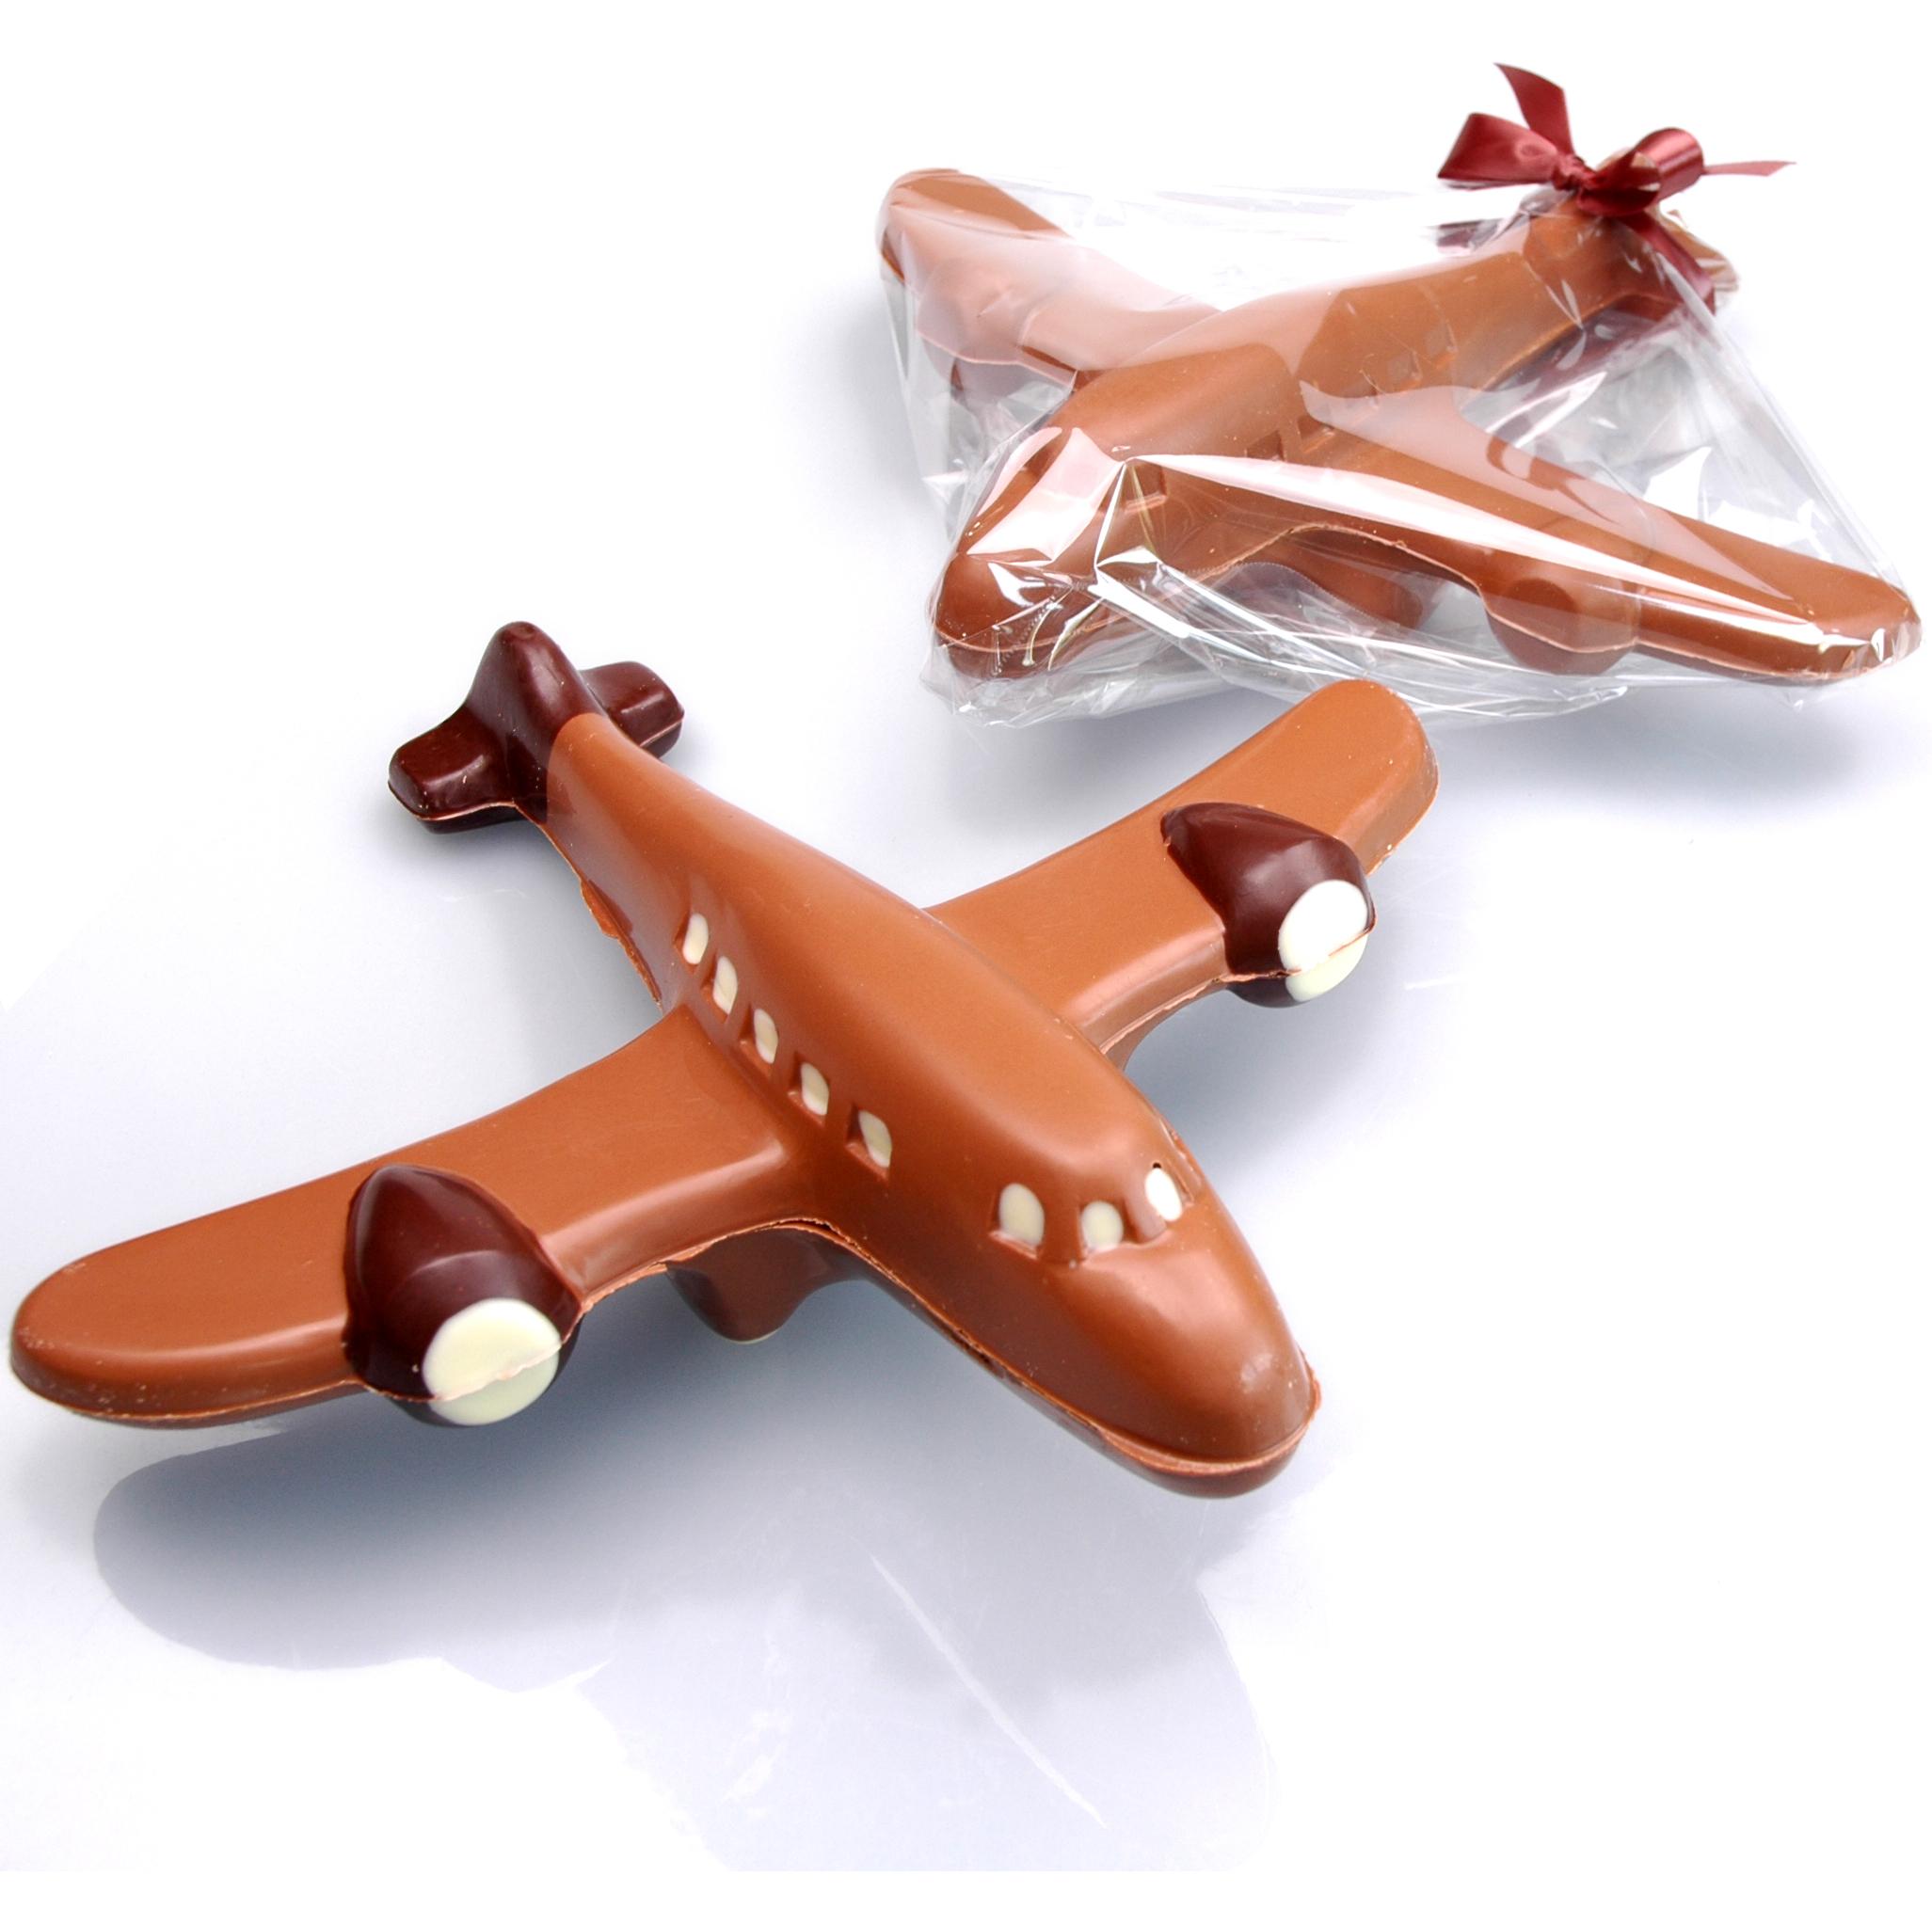 Chocolade vliegtuig als relatiegeschenk